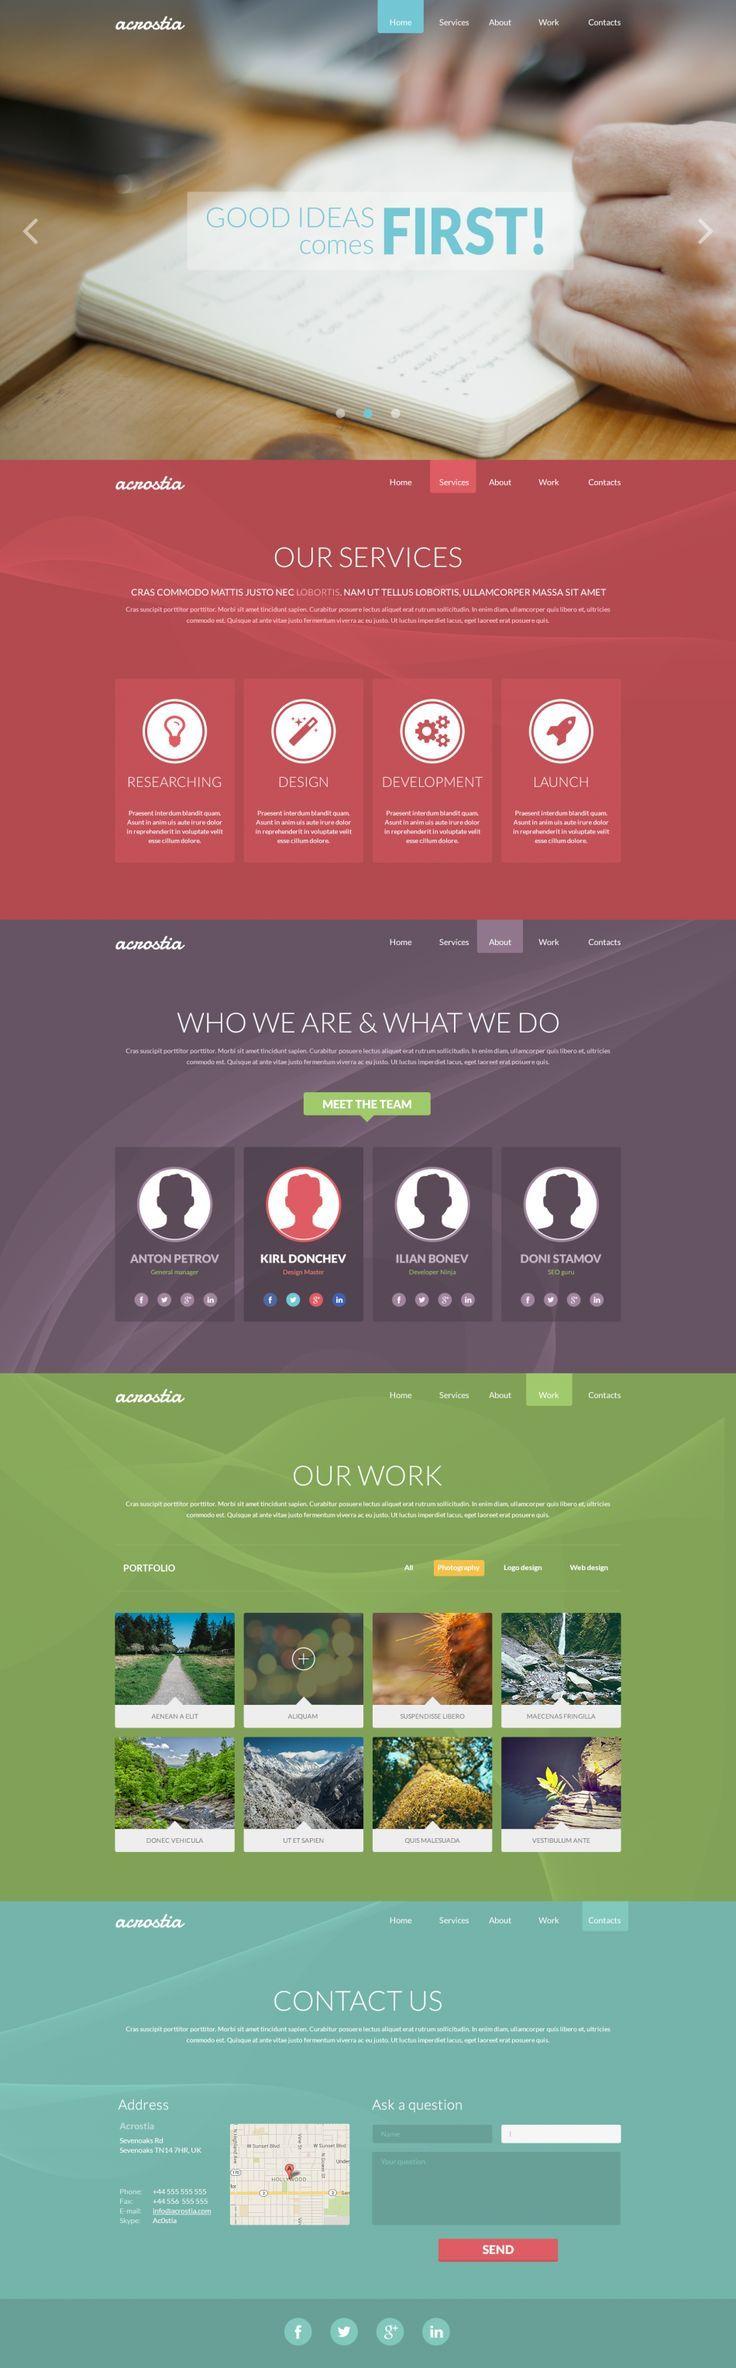 302 best web templates images on pinterest web layout website